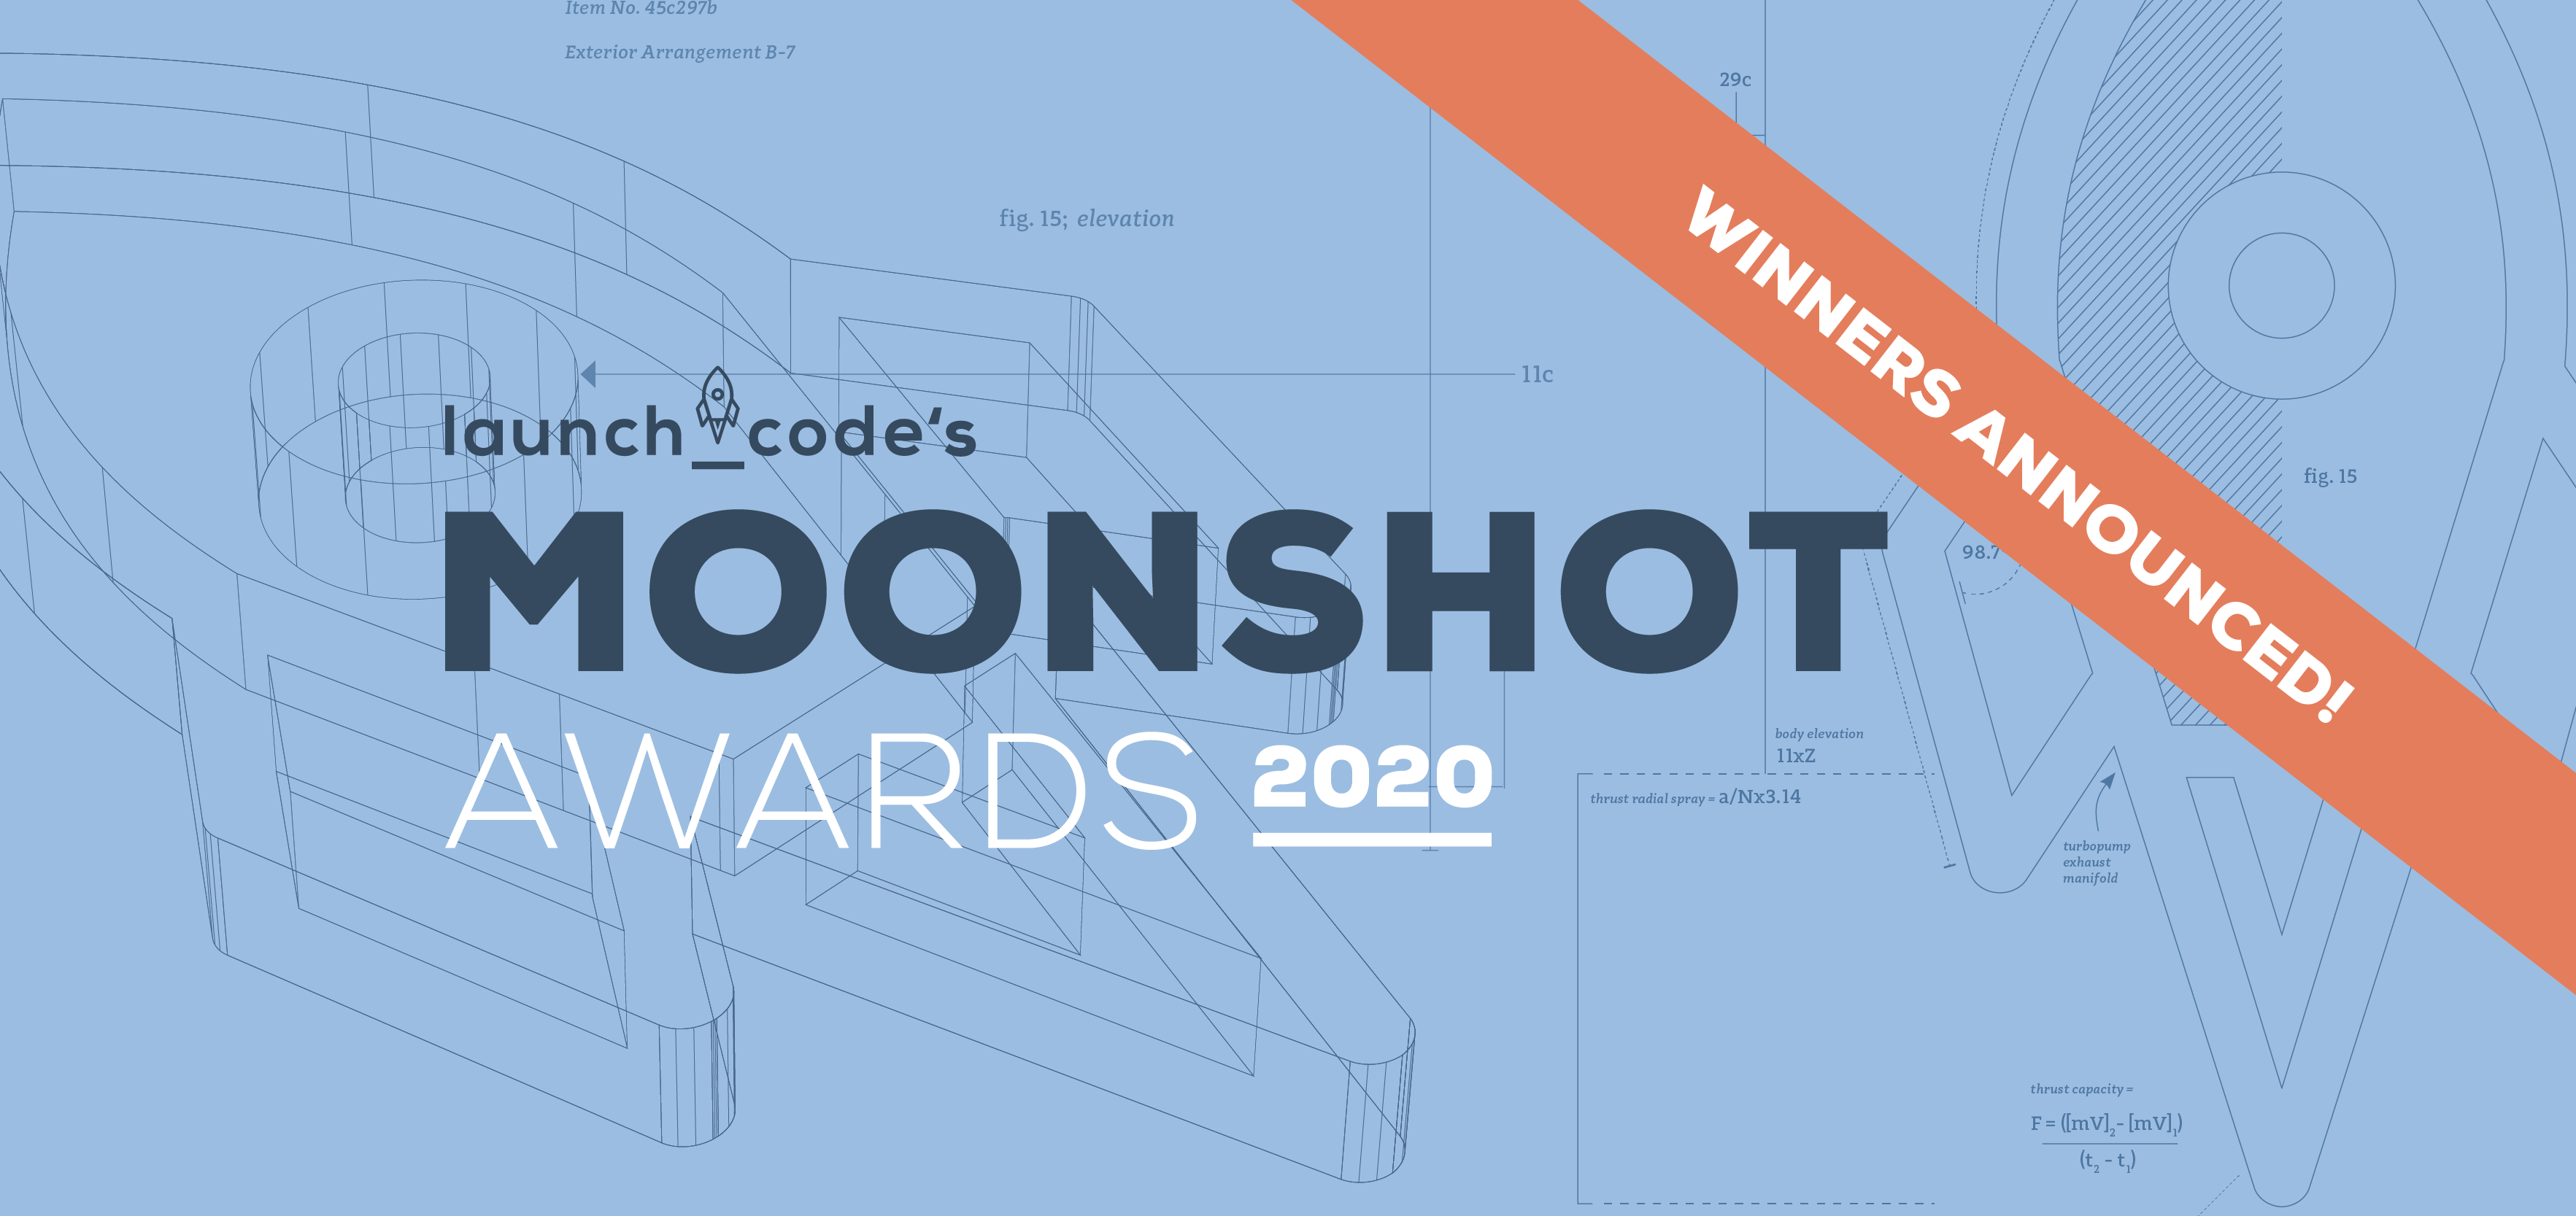 LaunchCode's Moonshot Awards 2021